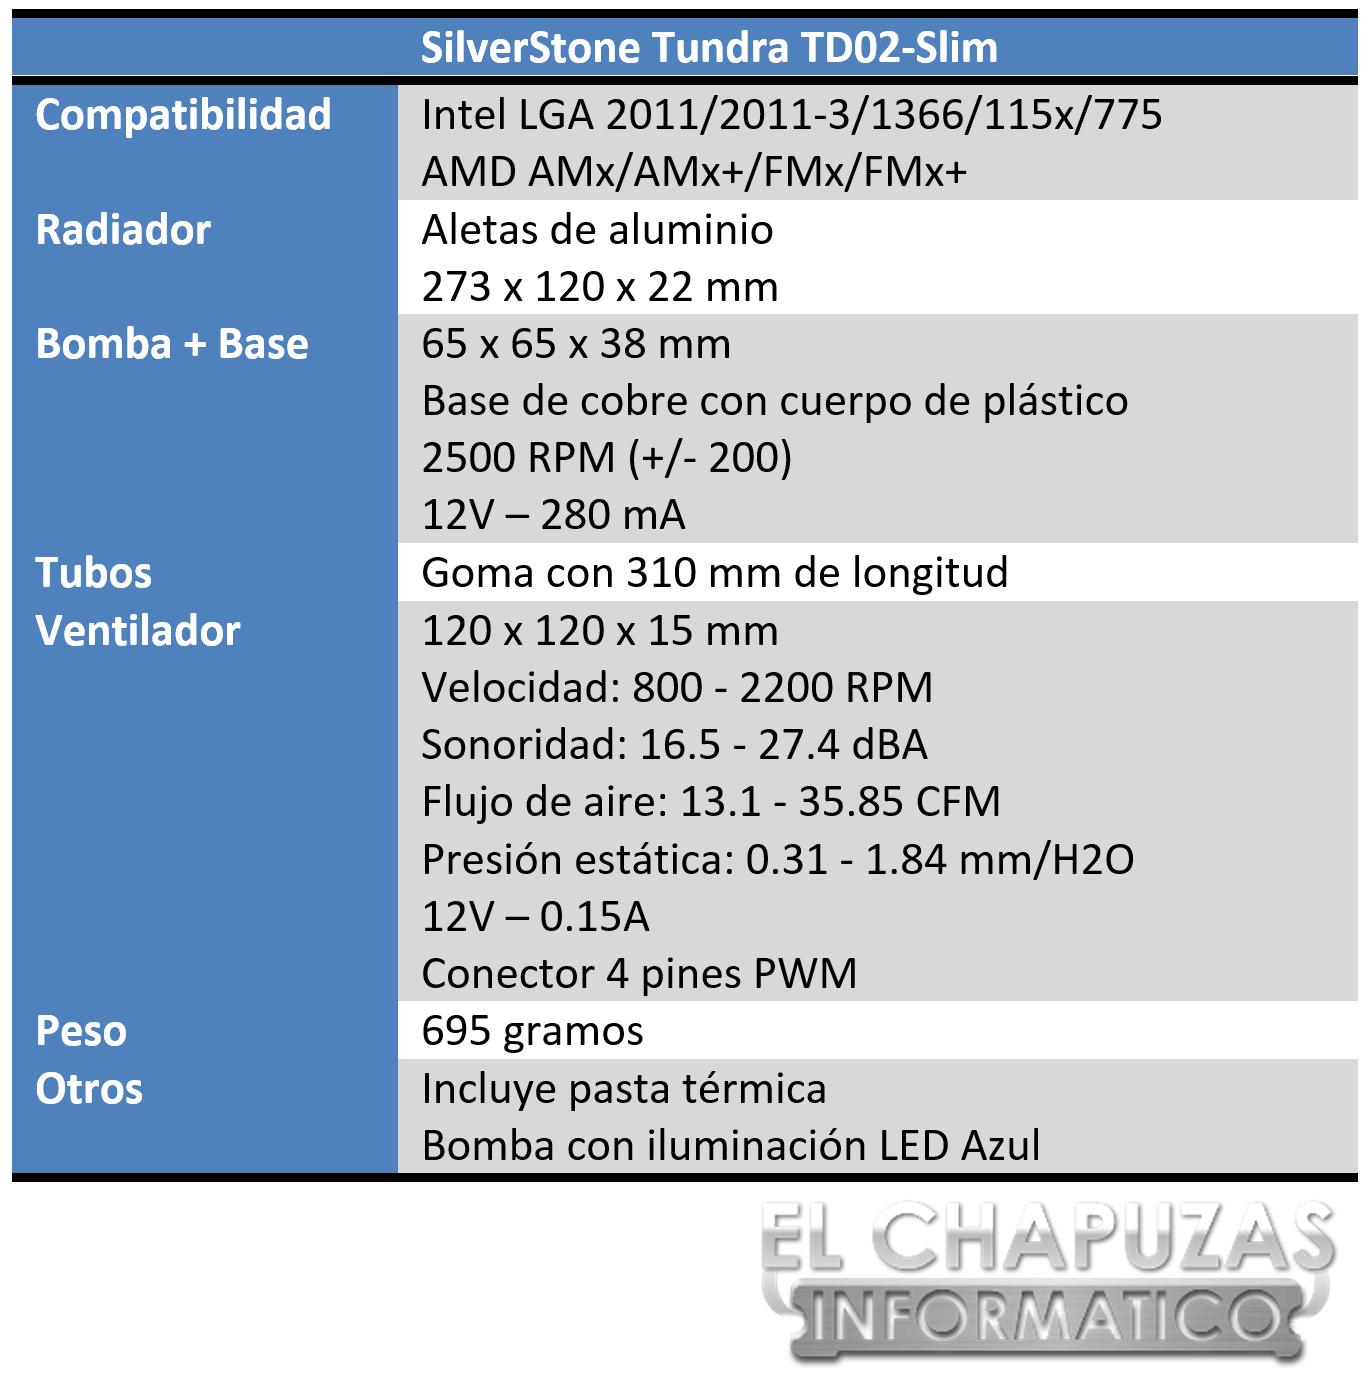 SilverStone Tundra TD02-Slim Especificaciones